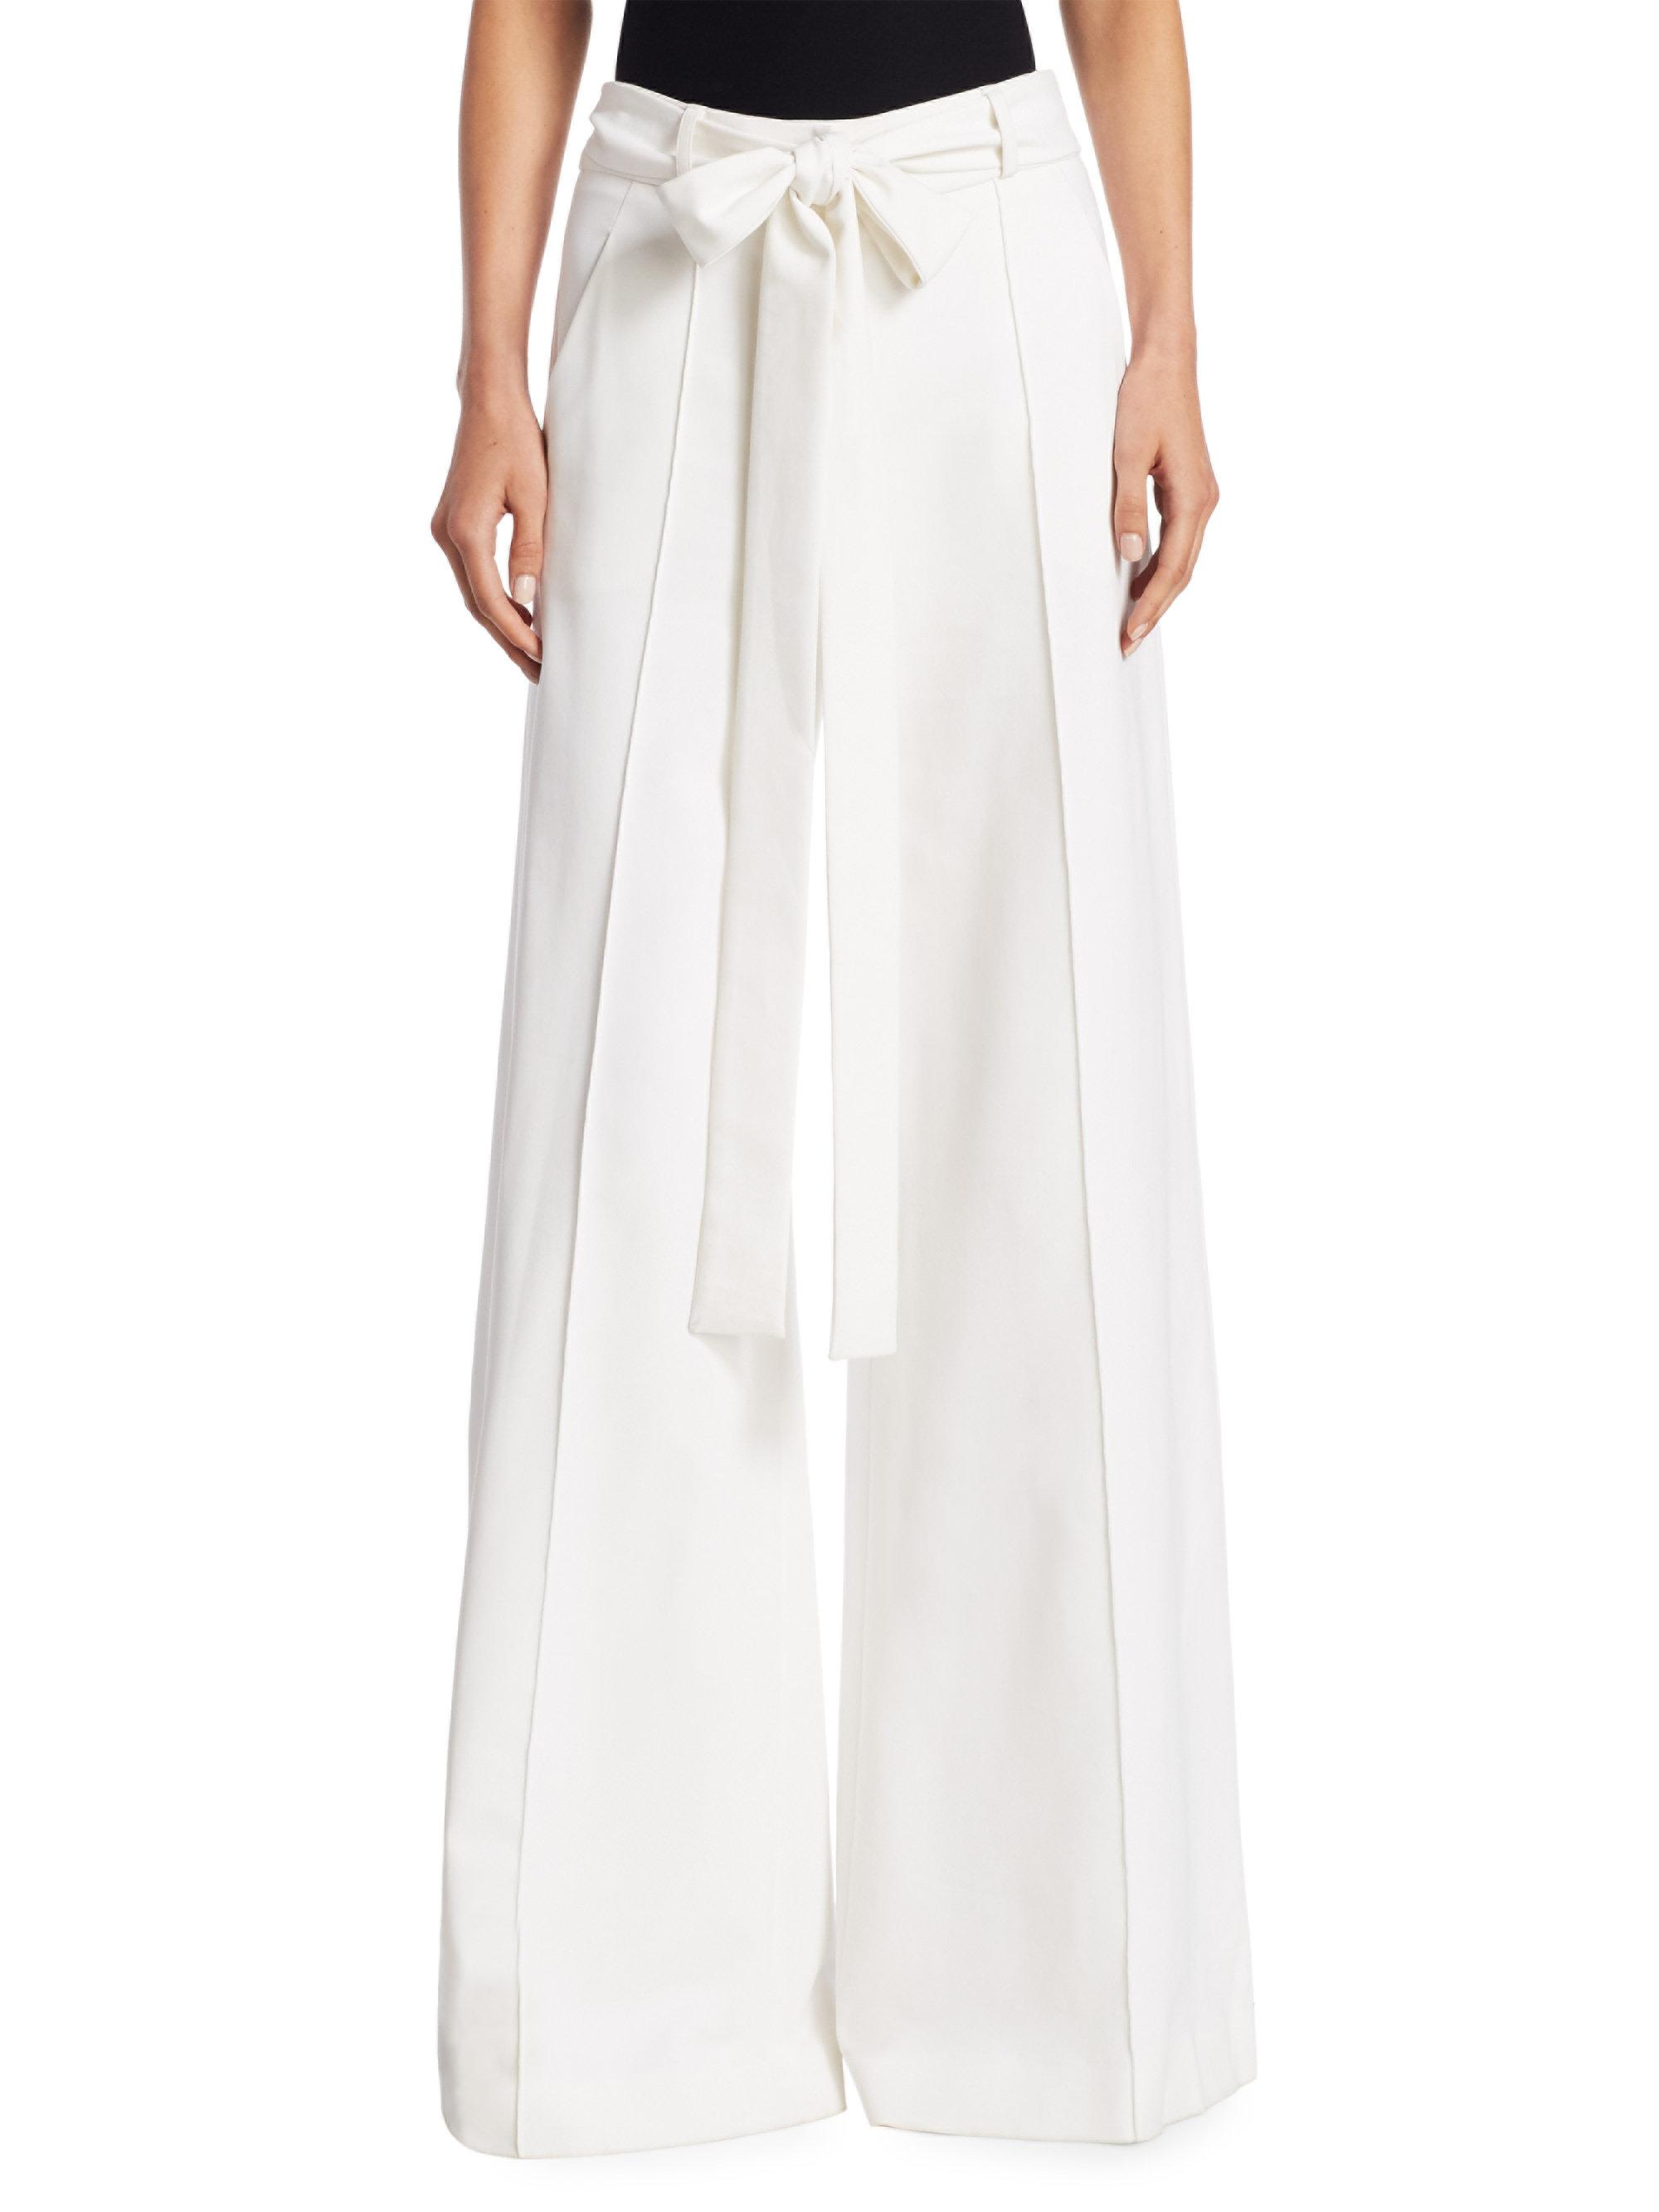 Wide leg trousers - White Carolina Herrera 7v6aWZ